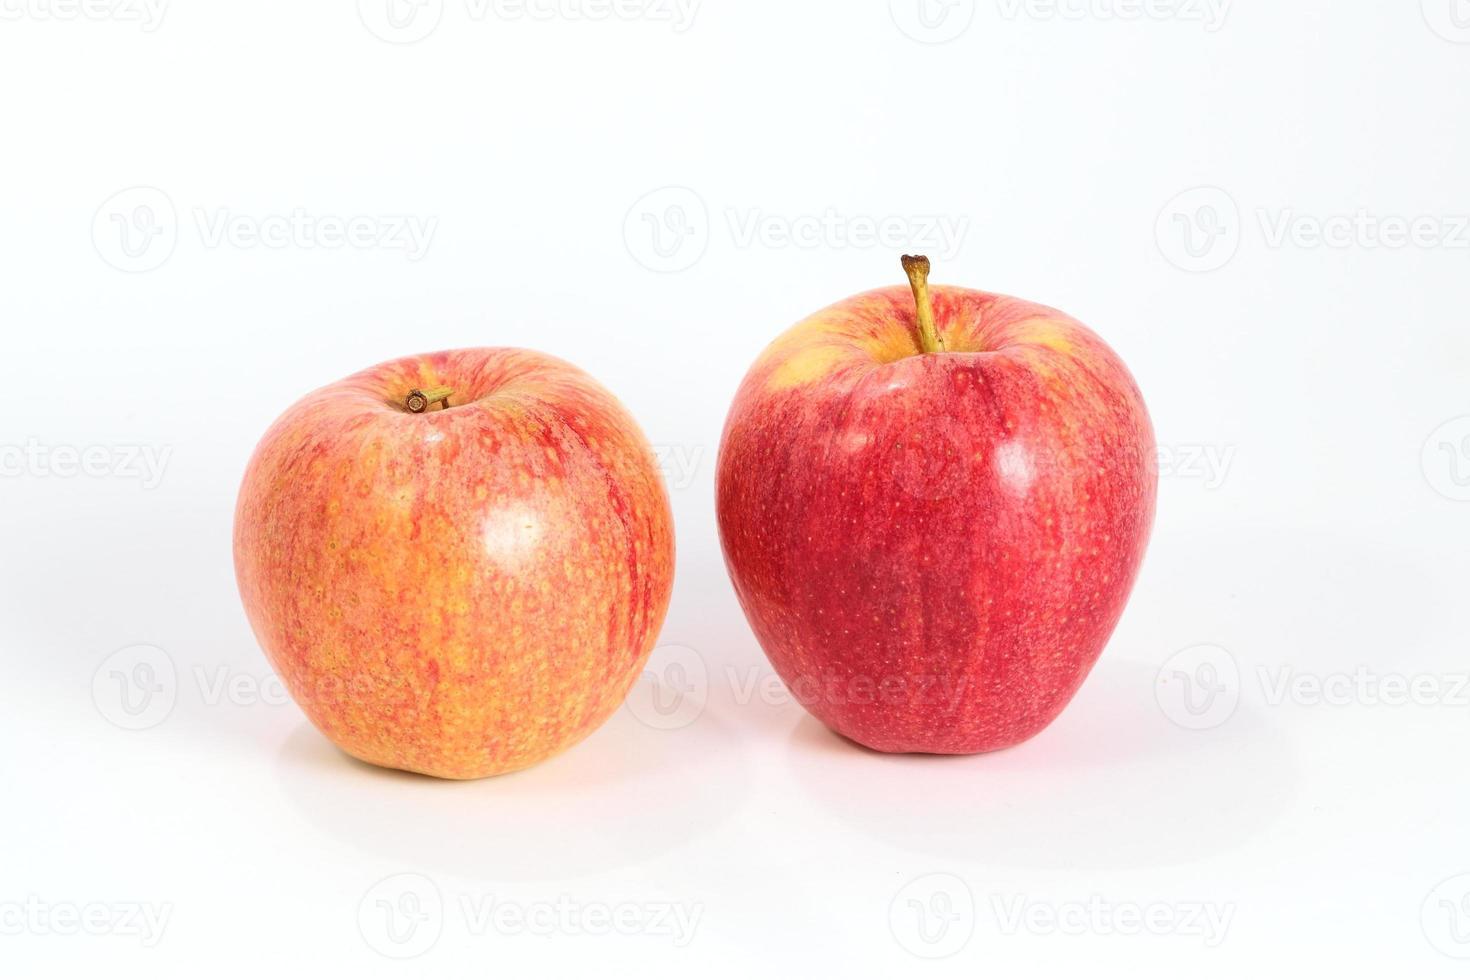 paar rode appels foto